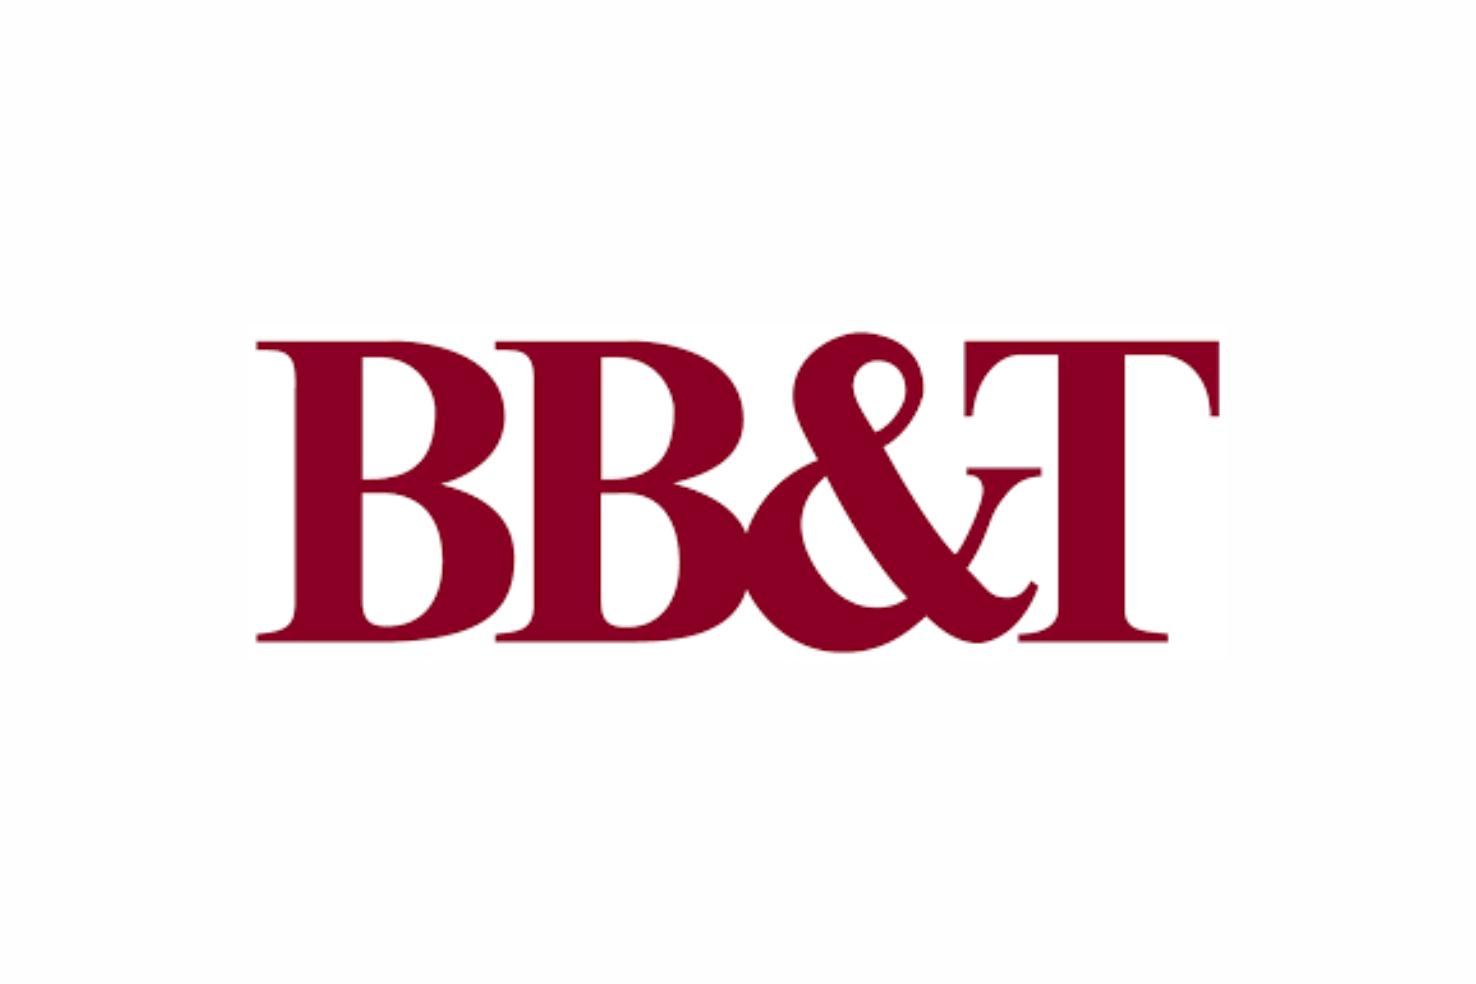 Tel fono bb t bank servicio al cliente bb t banca usa en for Telefono bb